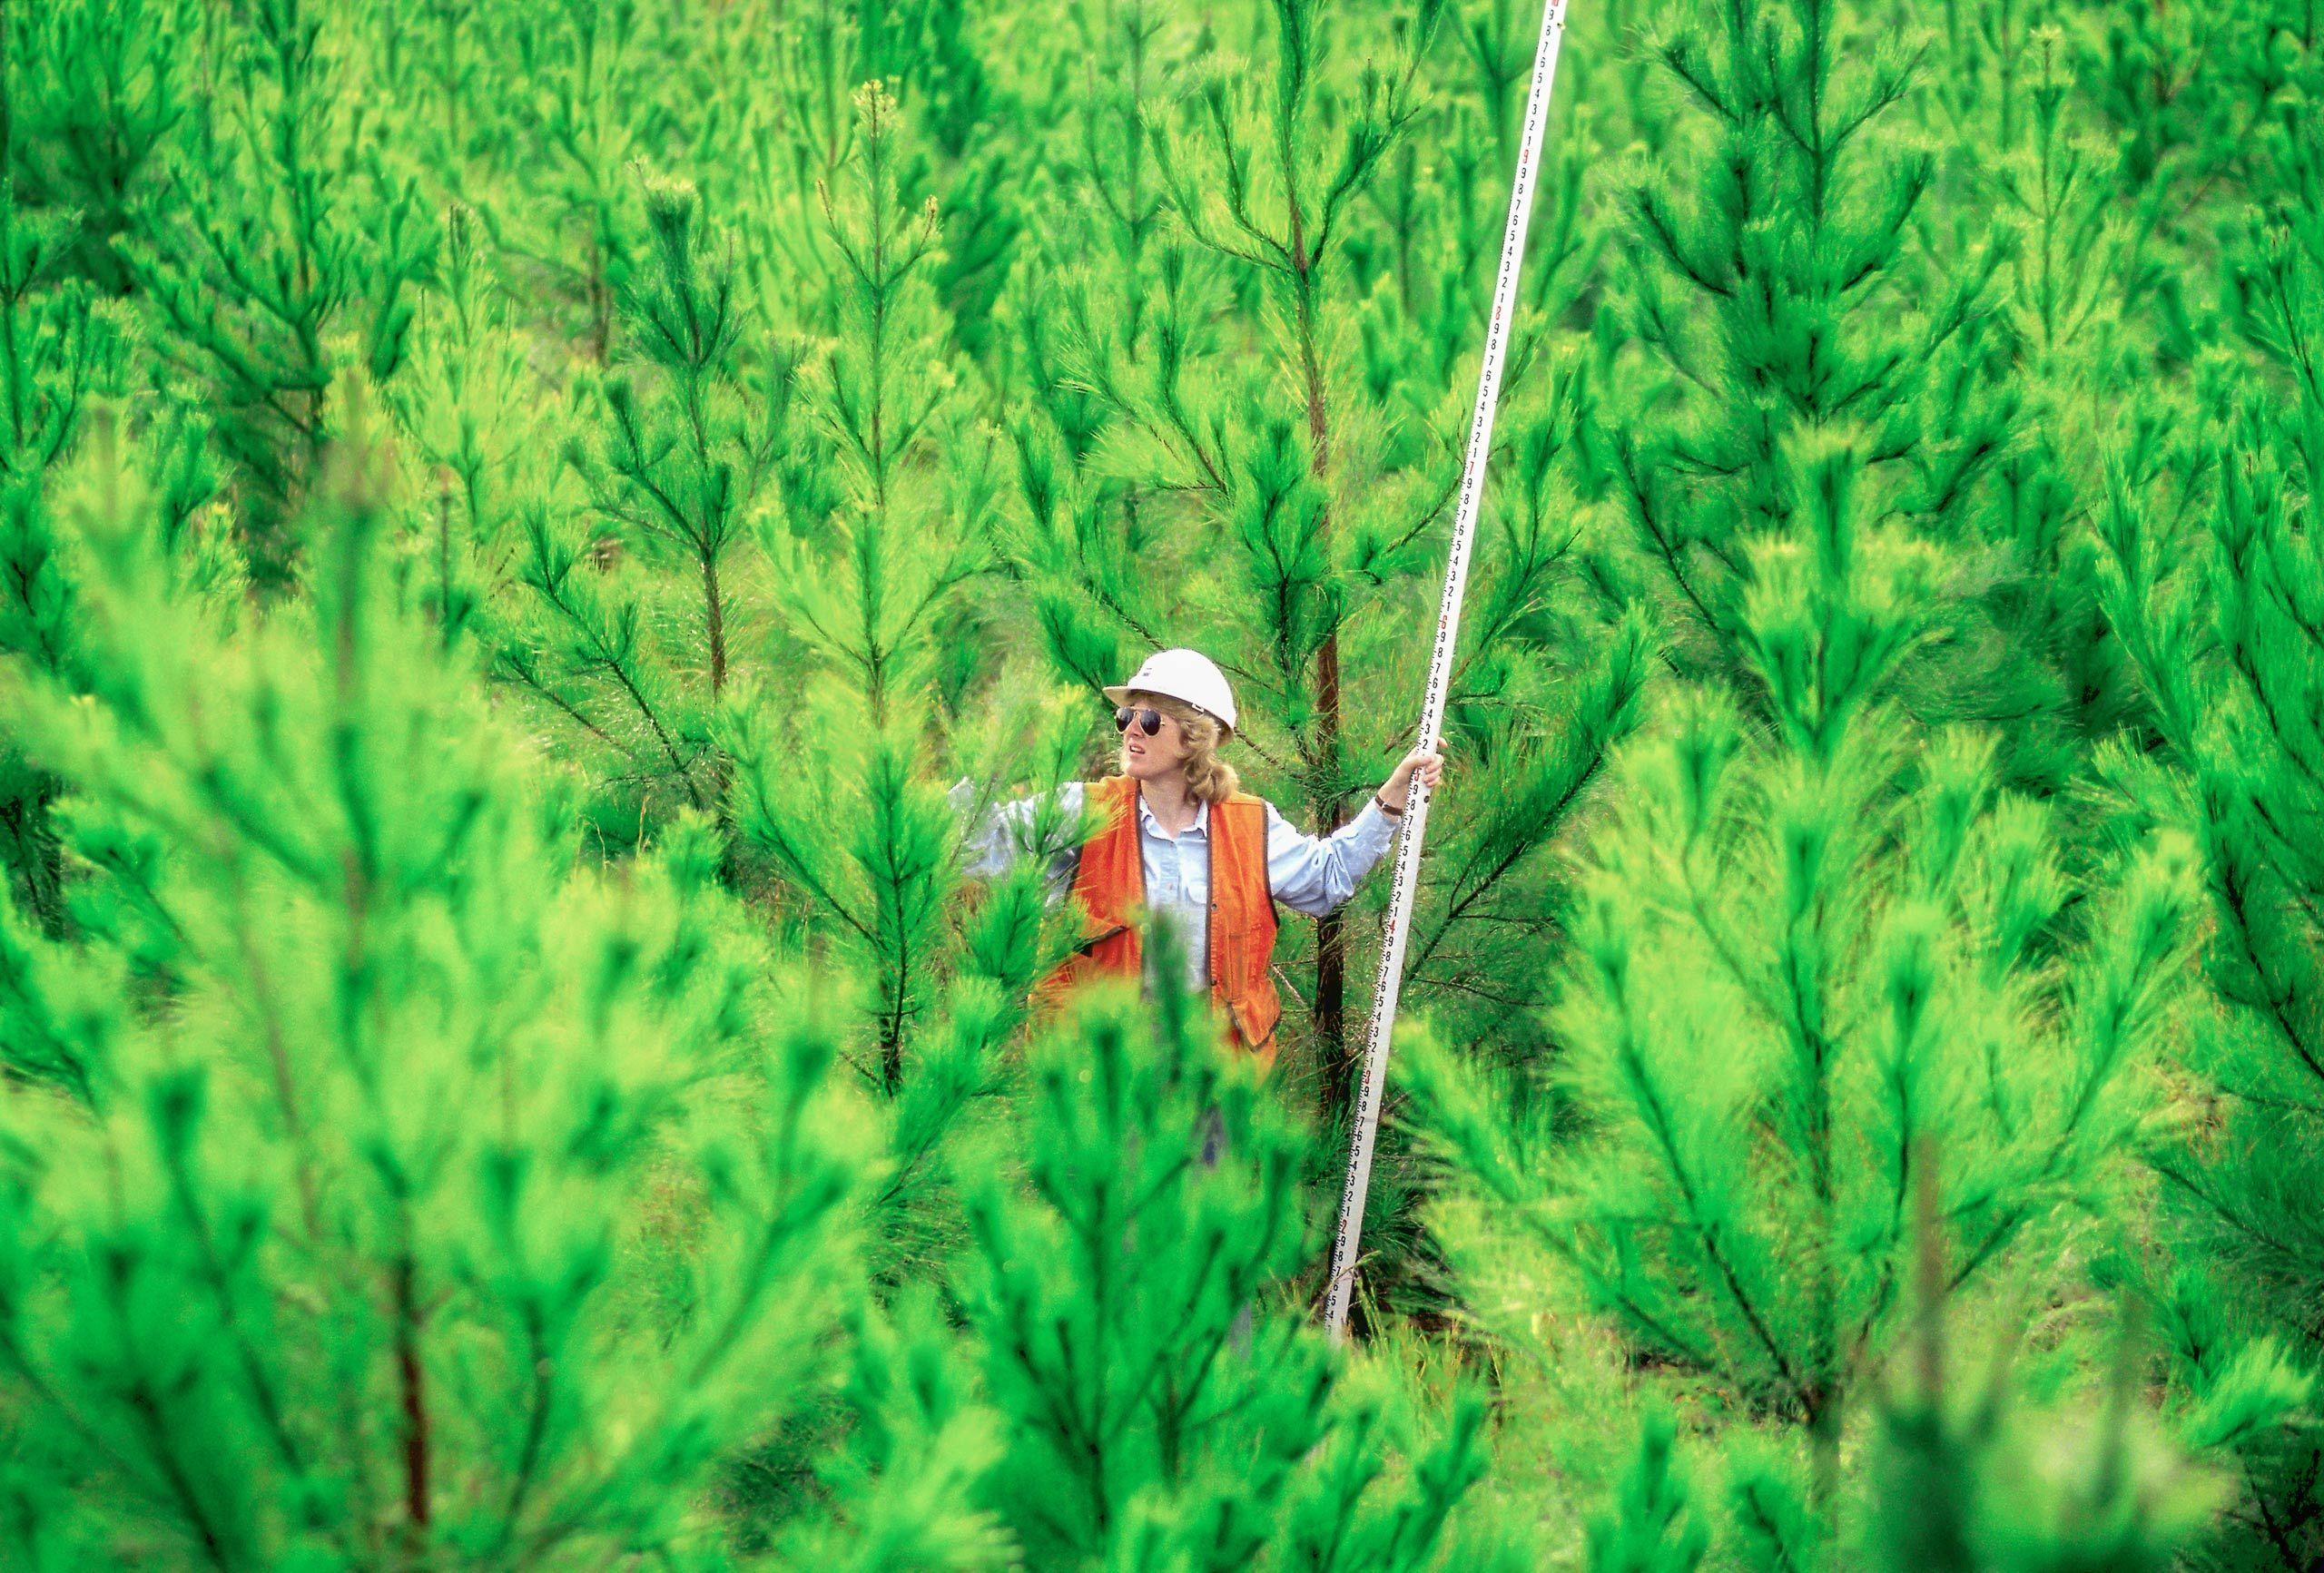 0009Roger_Tully_pine_nursery2000-Edit.jpg